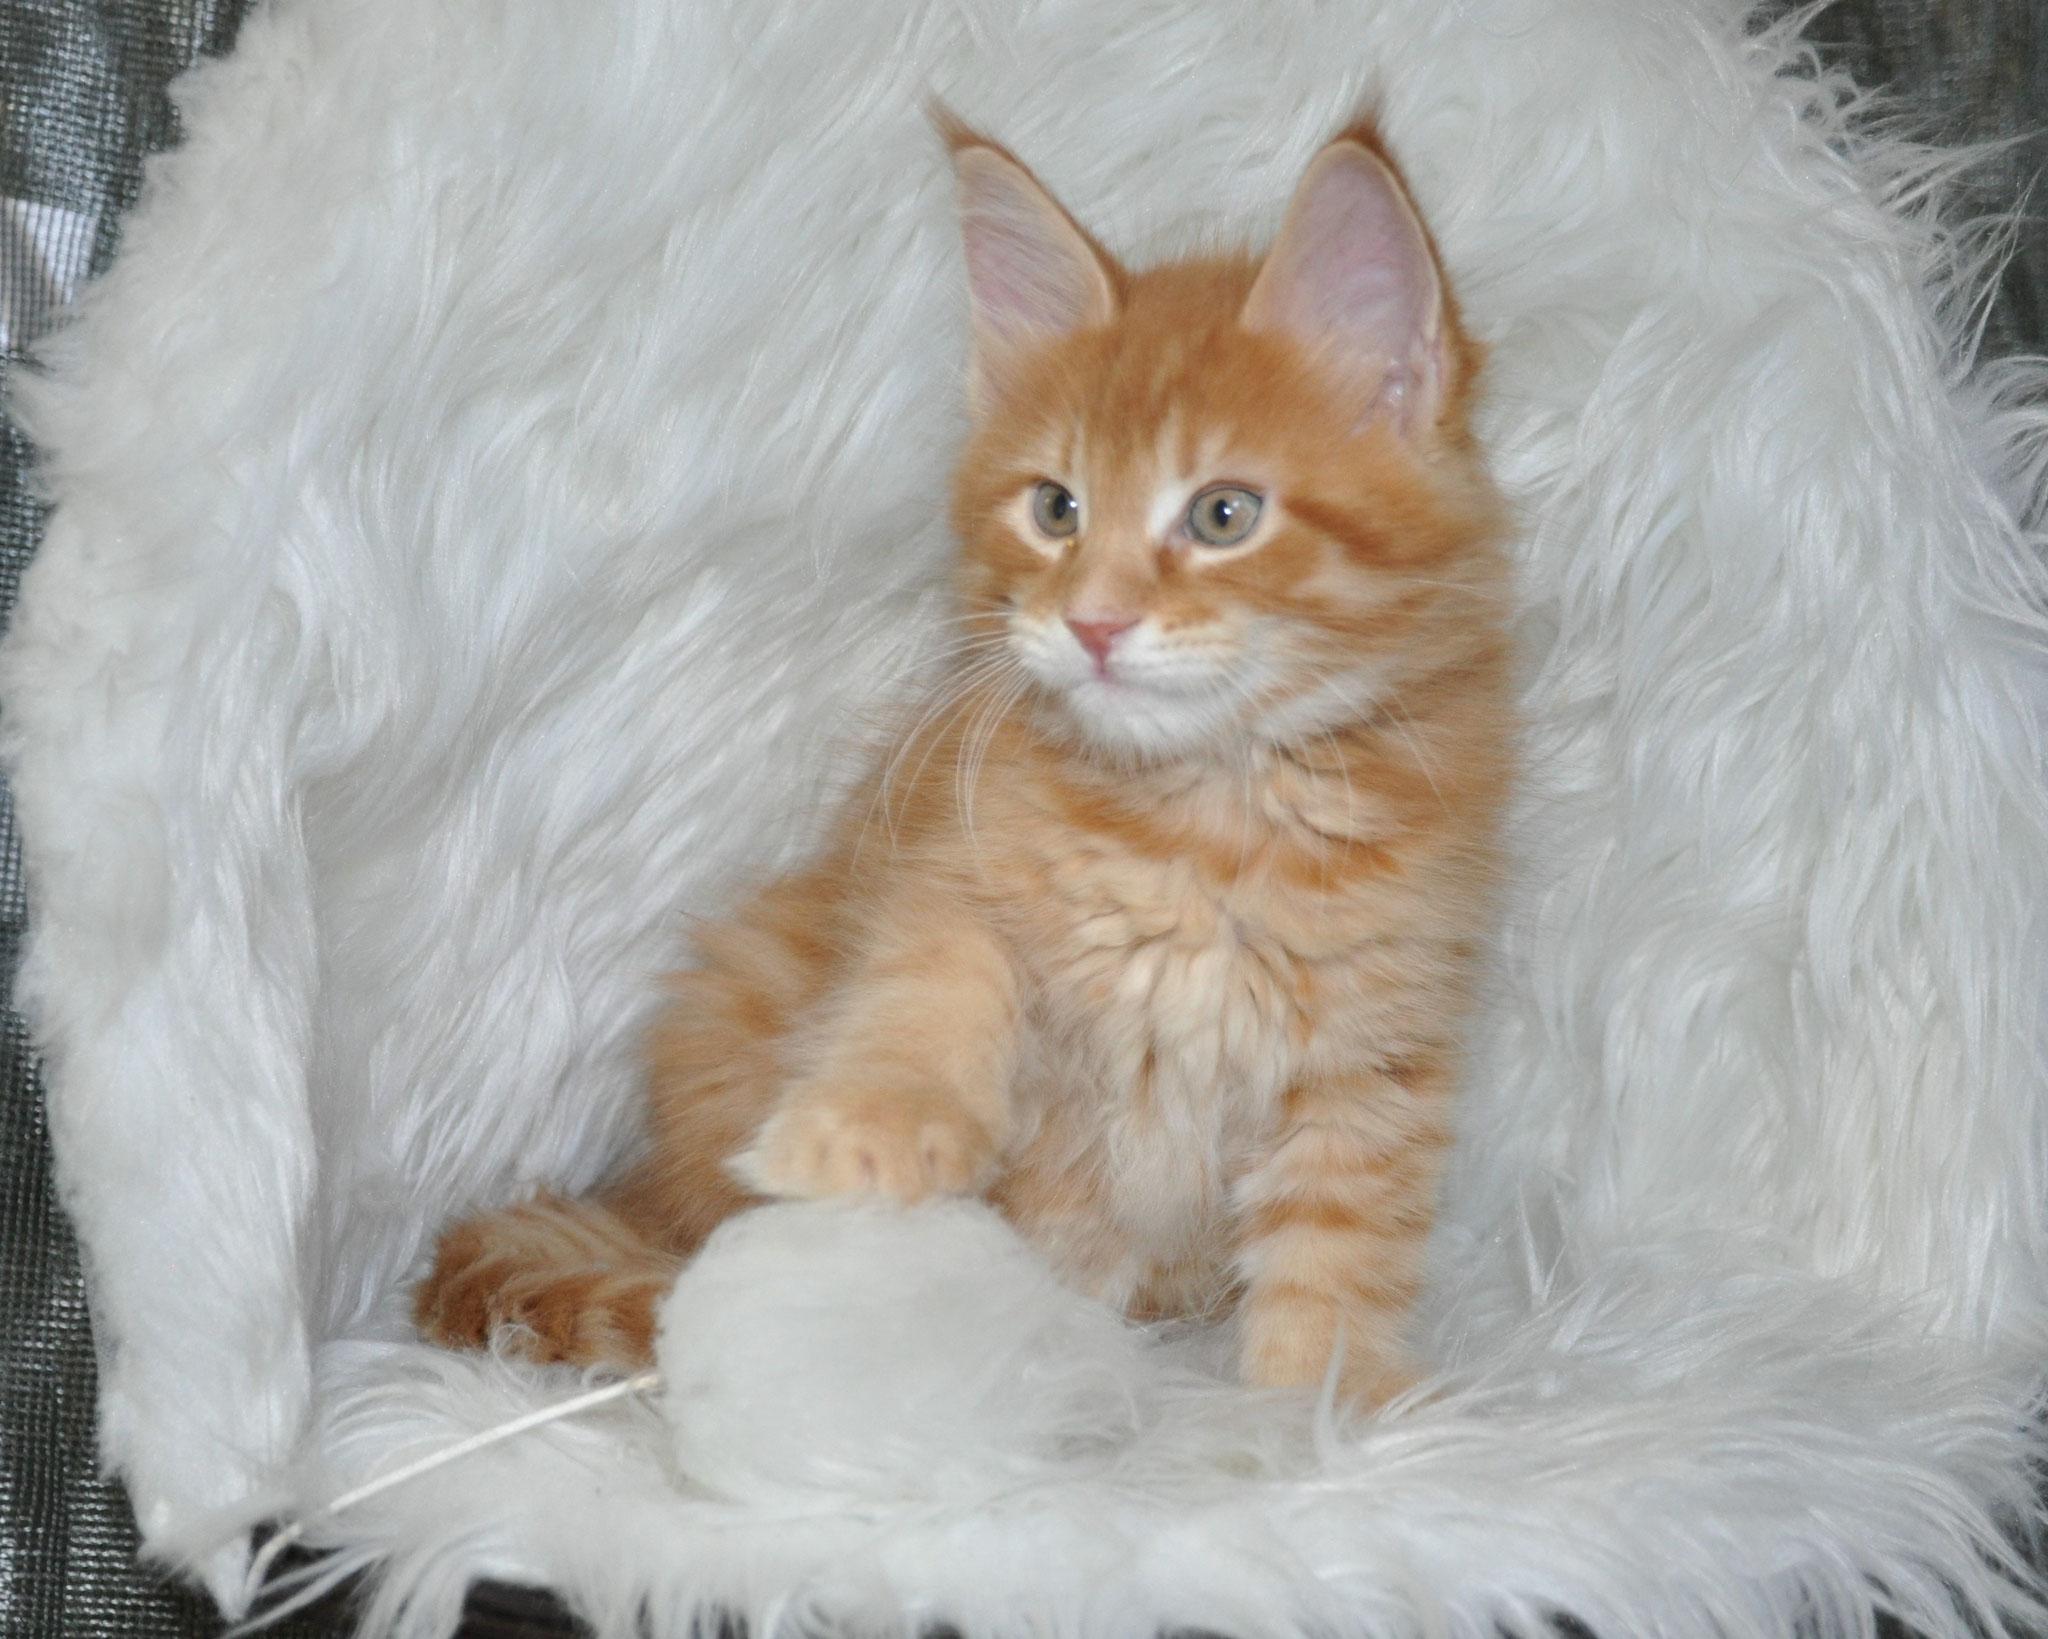 Dominic, 8 weeks